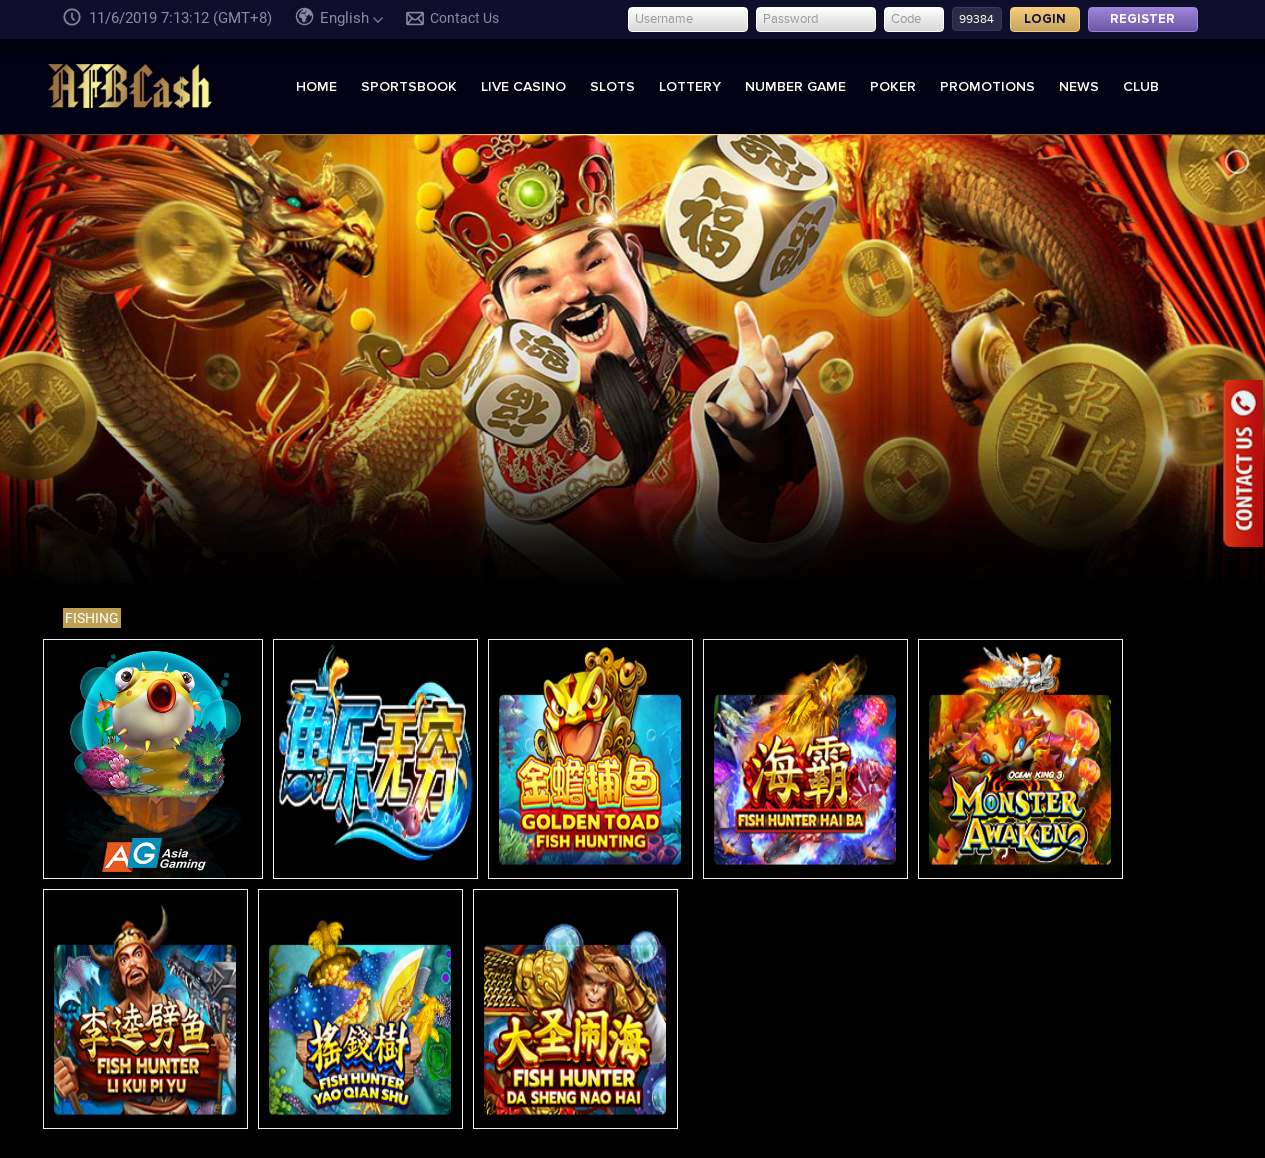 Tembak Ikan Games Online Slots Malaysia